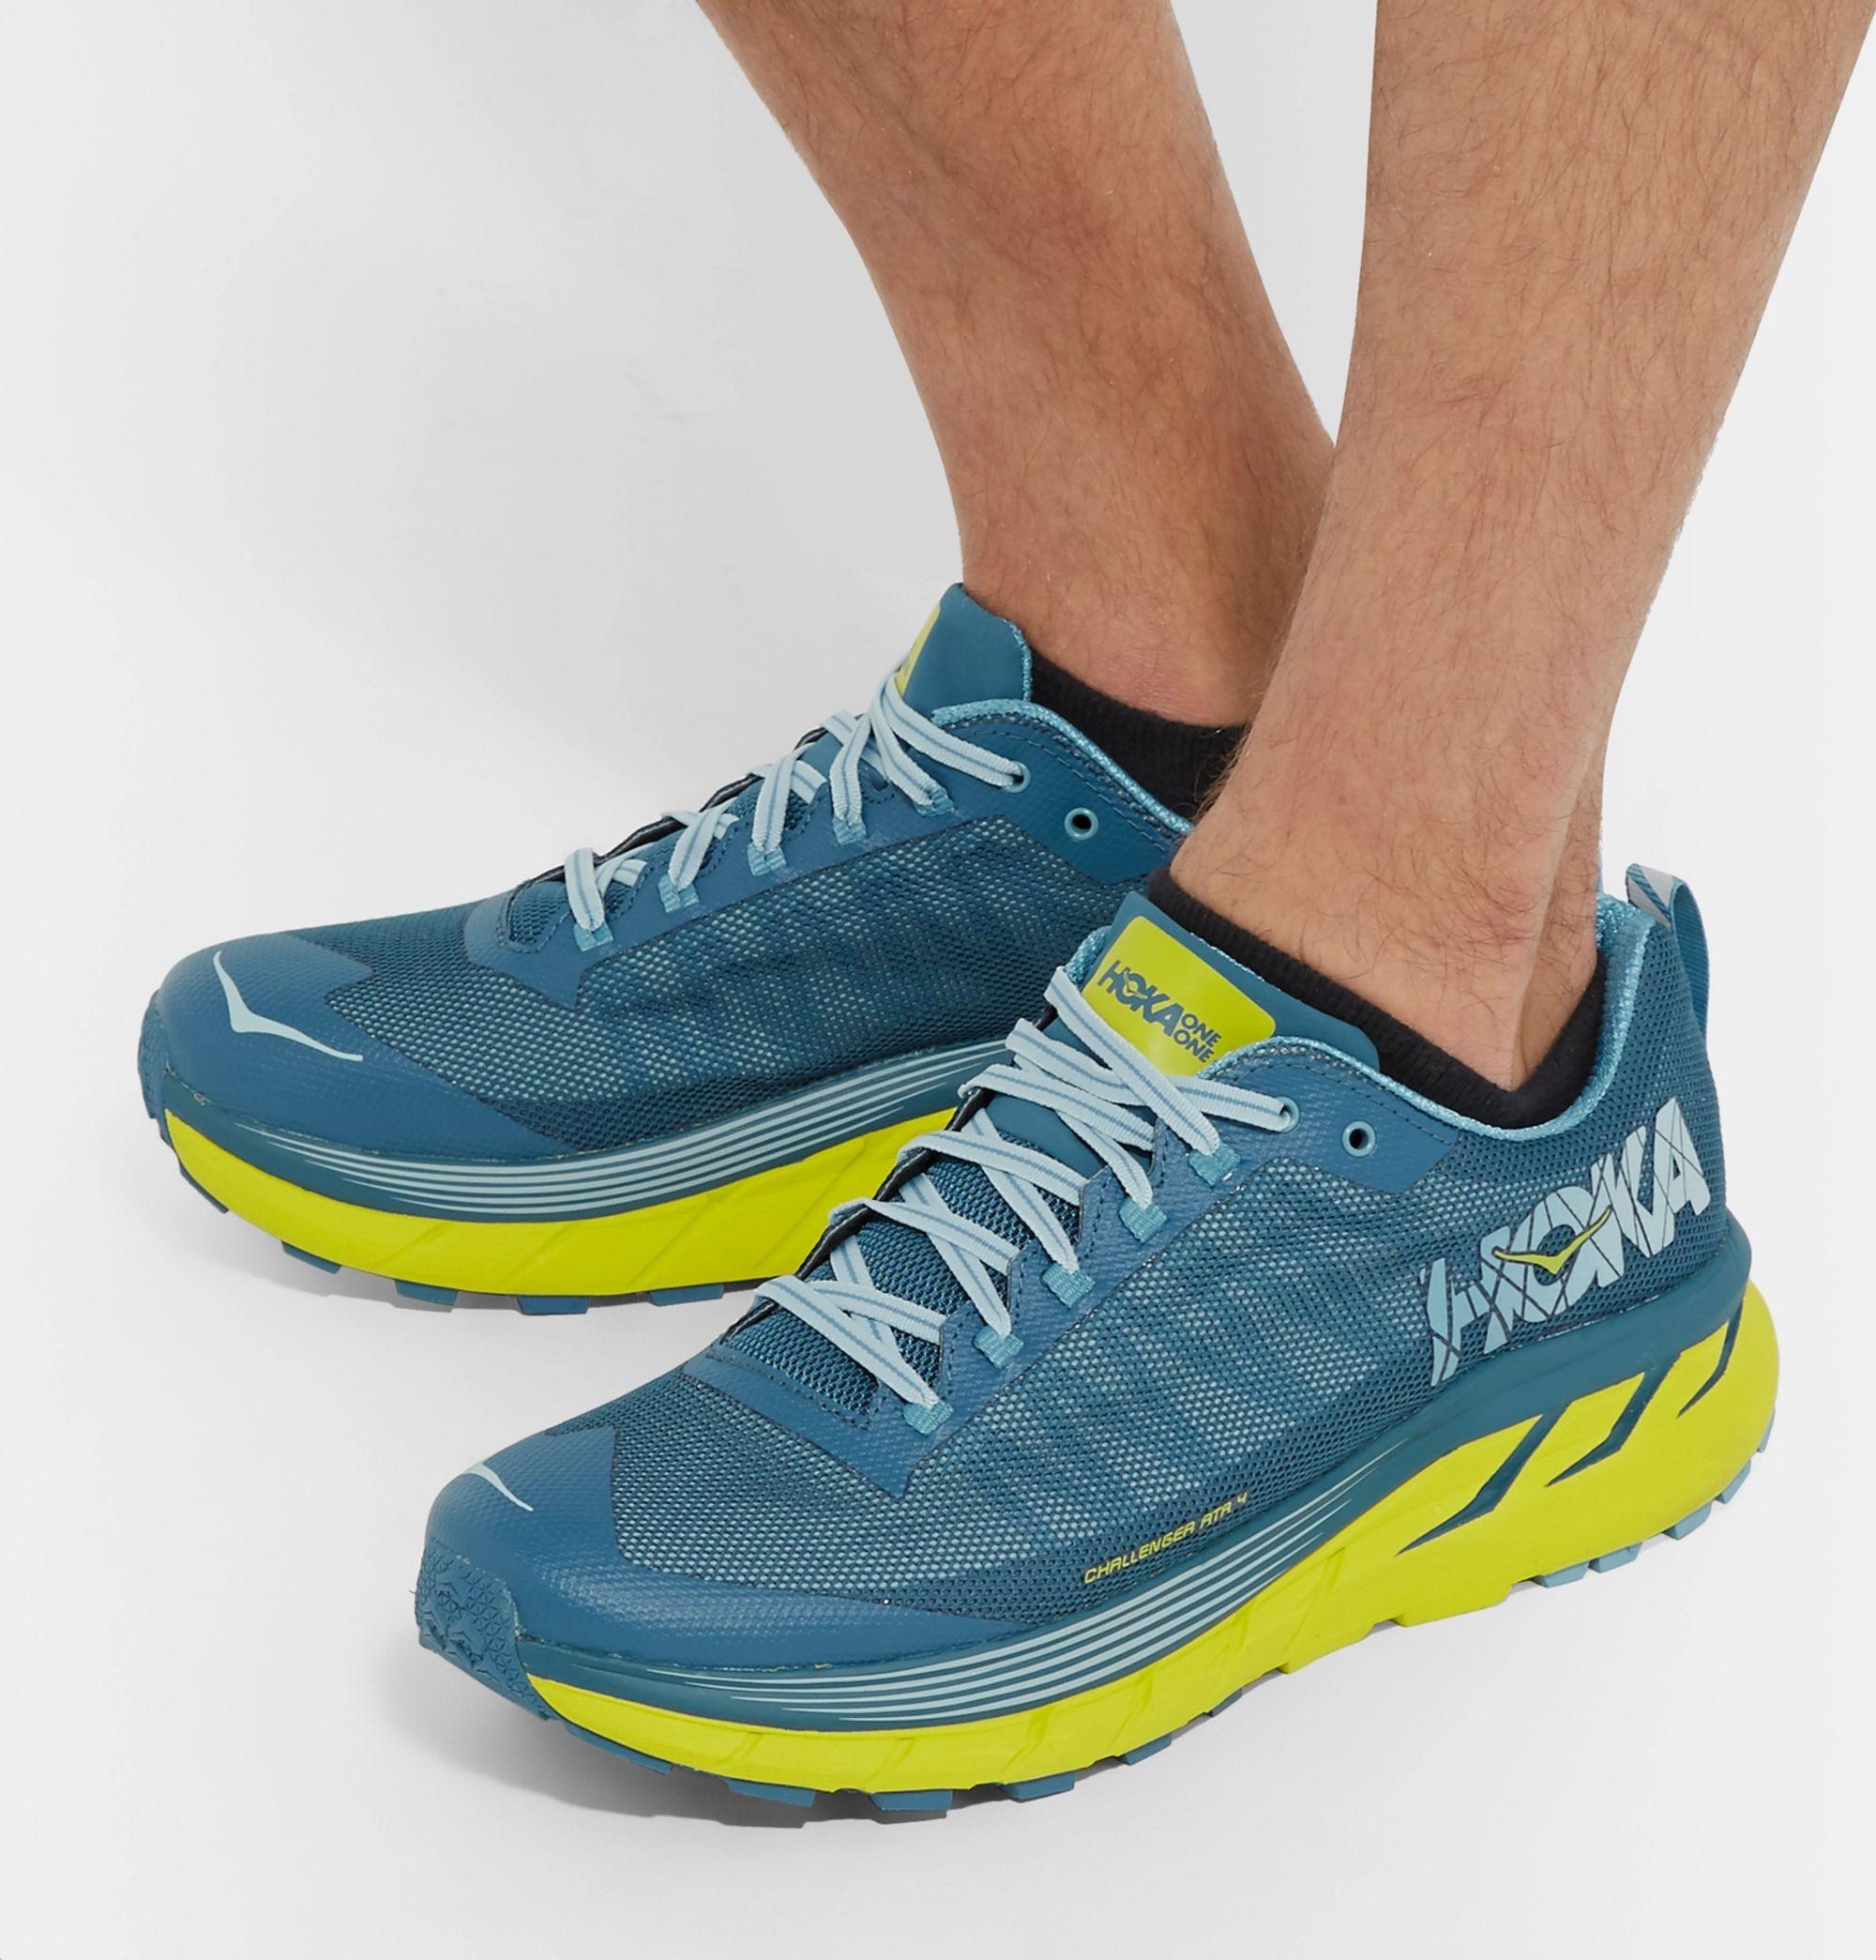 hoka running shoes near me